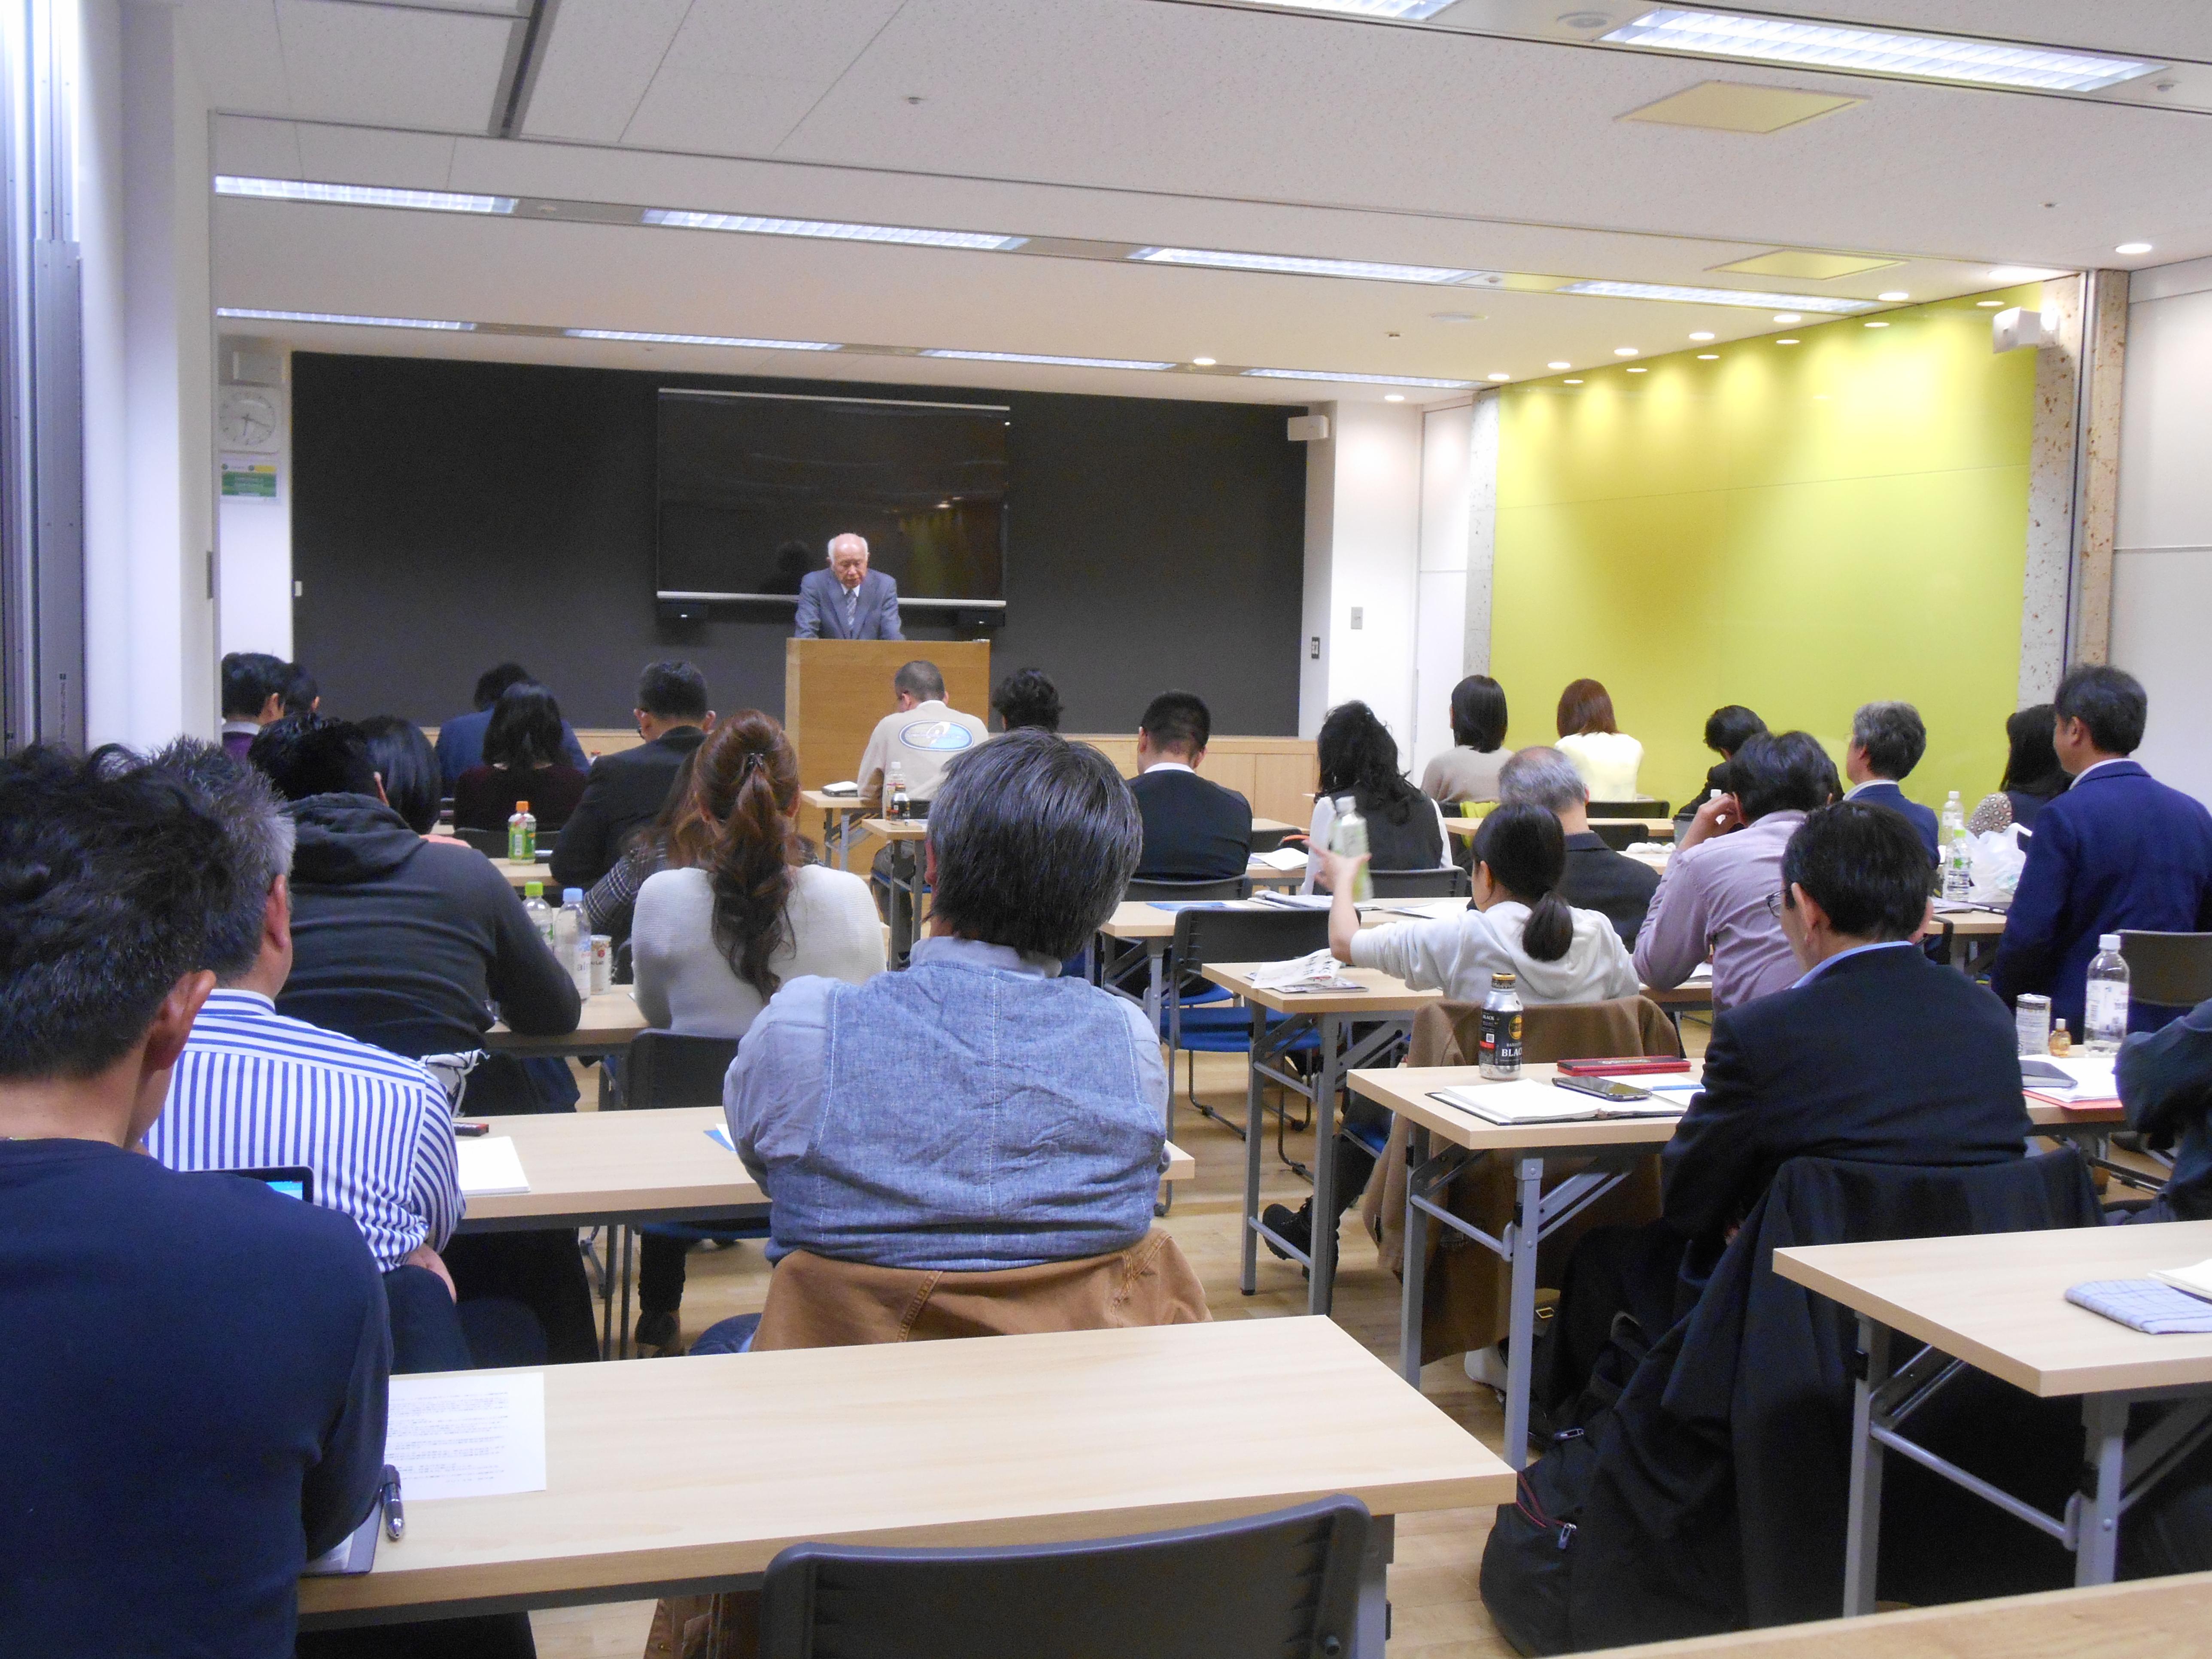 DSCN1254 - 4月1日東京思風塾の開催になります。